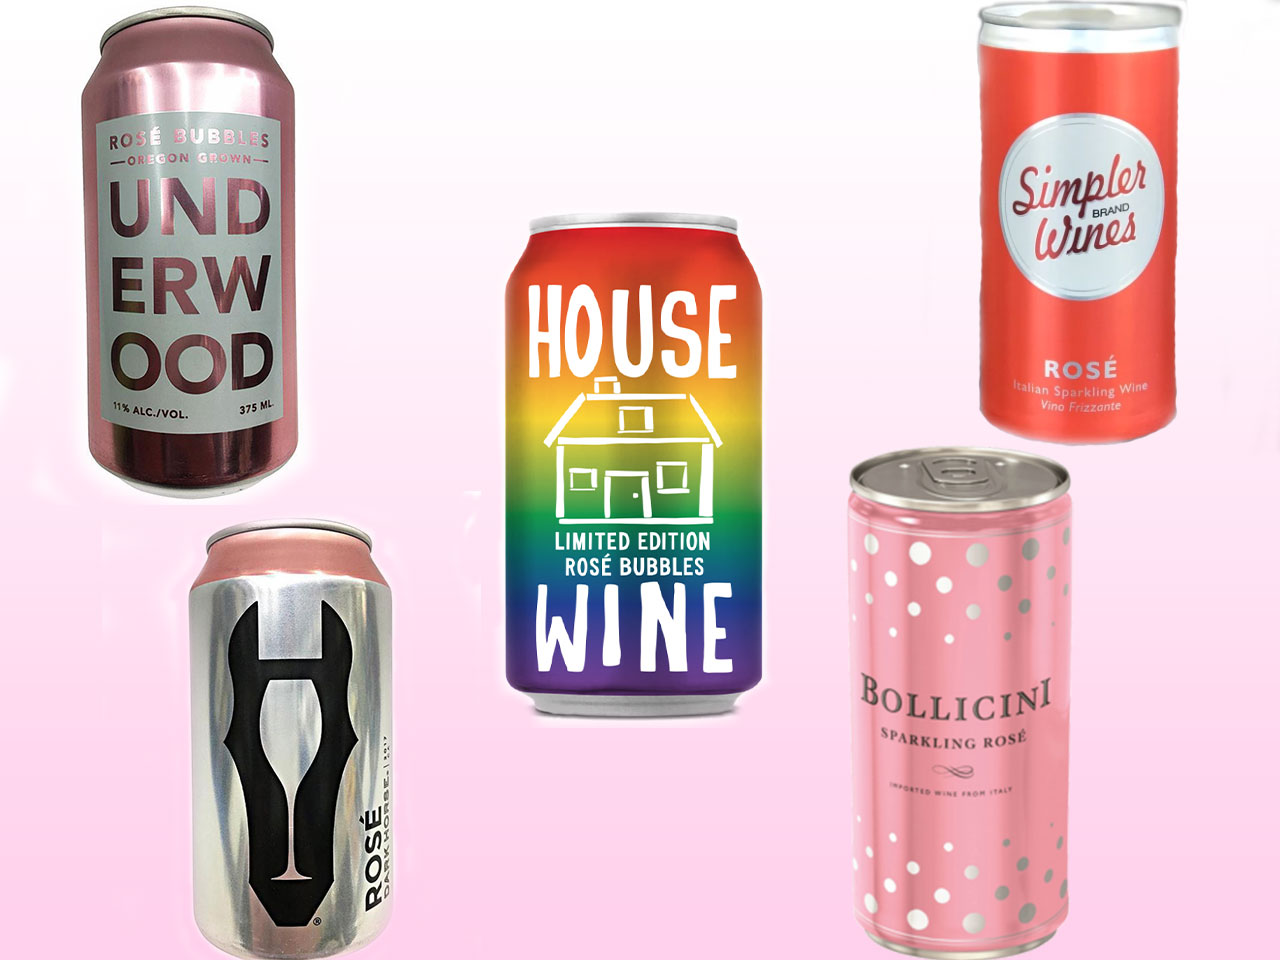 Canned Rose test taste.jpg